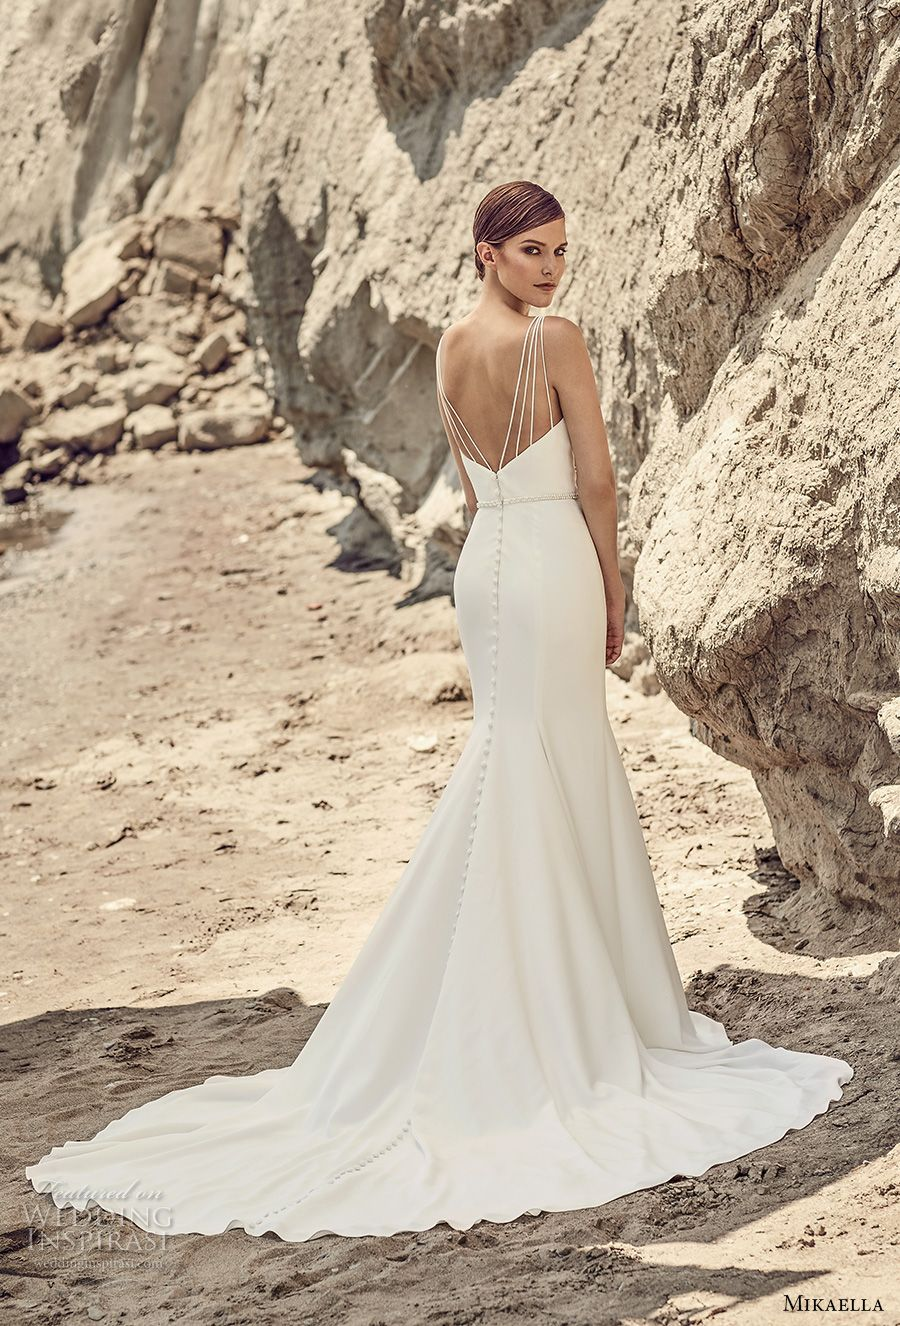 Mikaella Bridal Spring 2017 Wedding Dresses | Pinterest | Clean ...